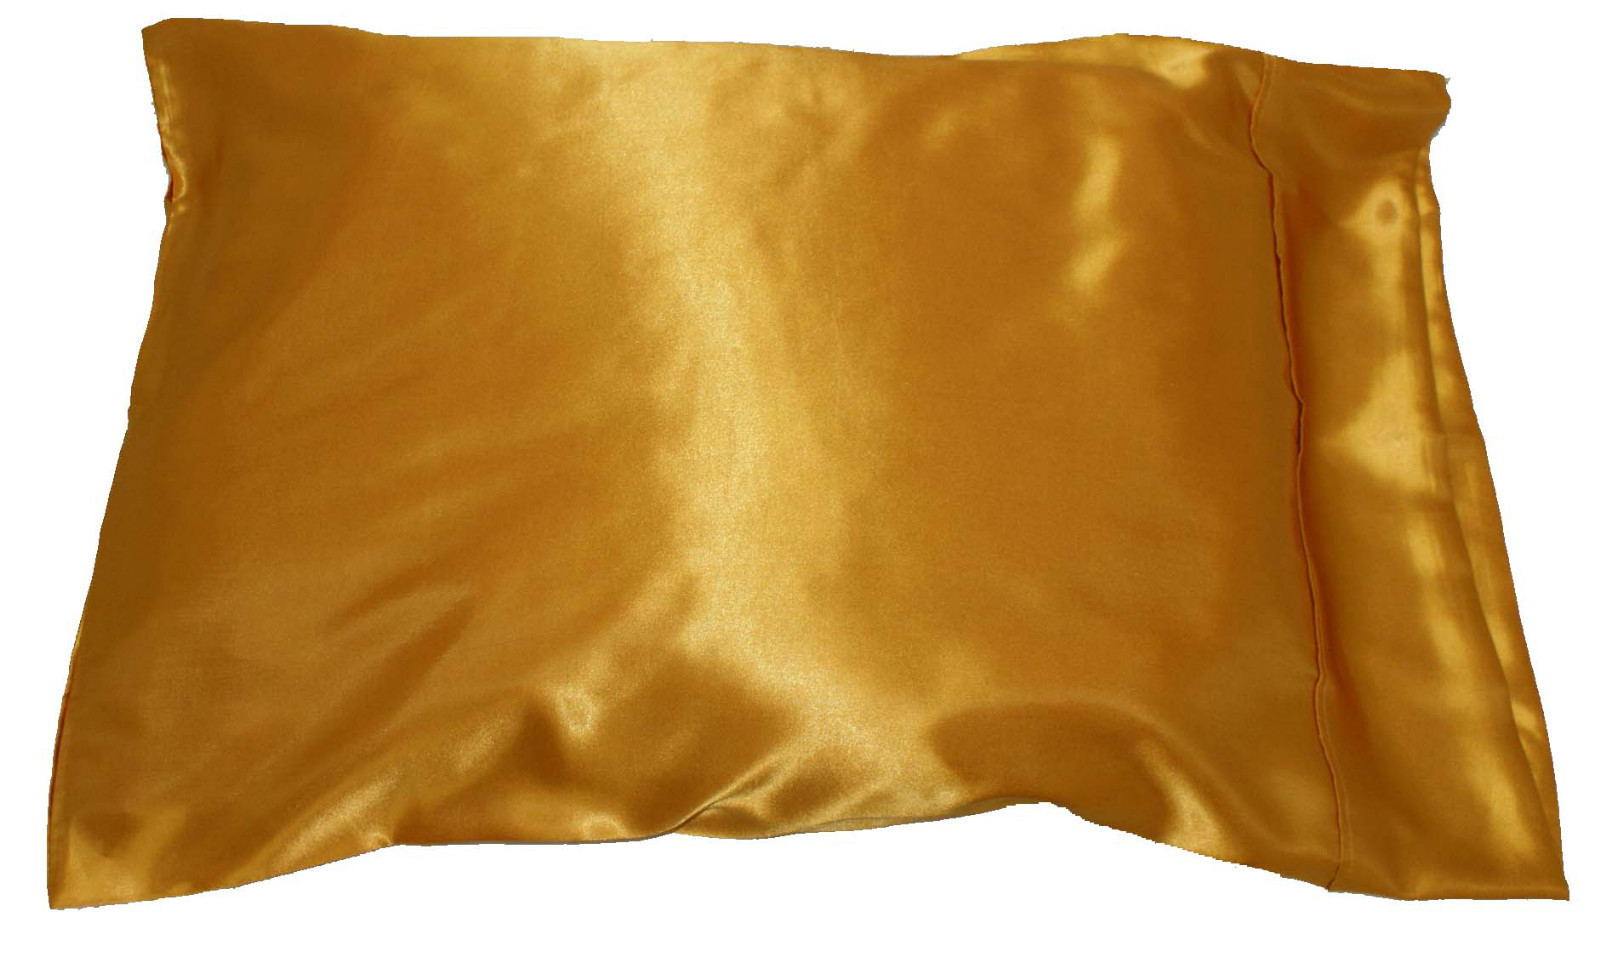 1pc new size silky satin pillow case multiple colors thumbnail 3